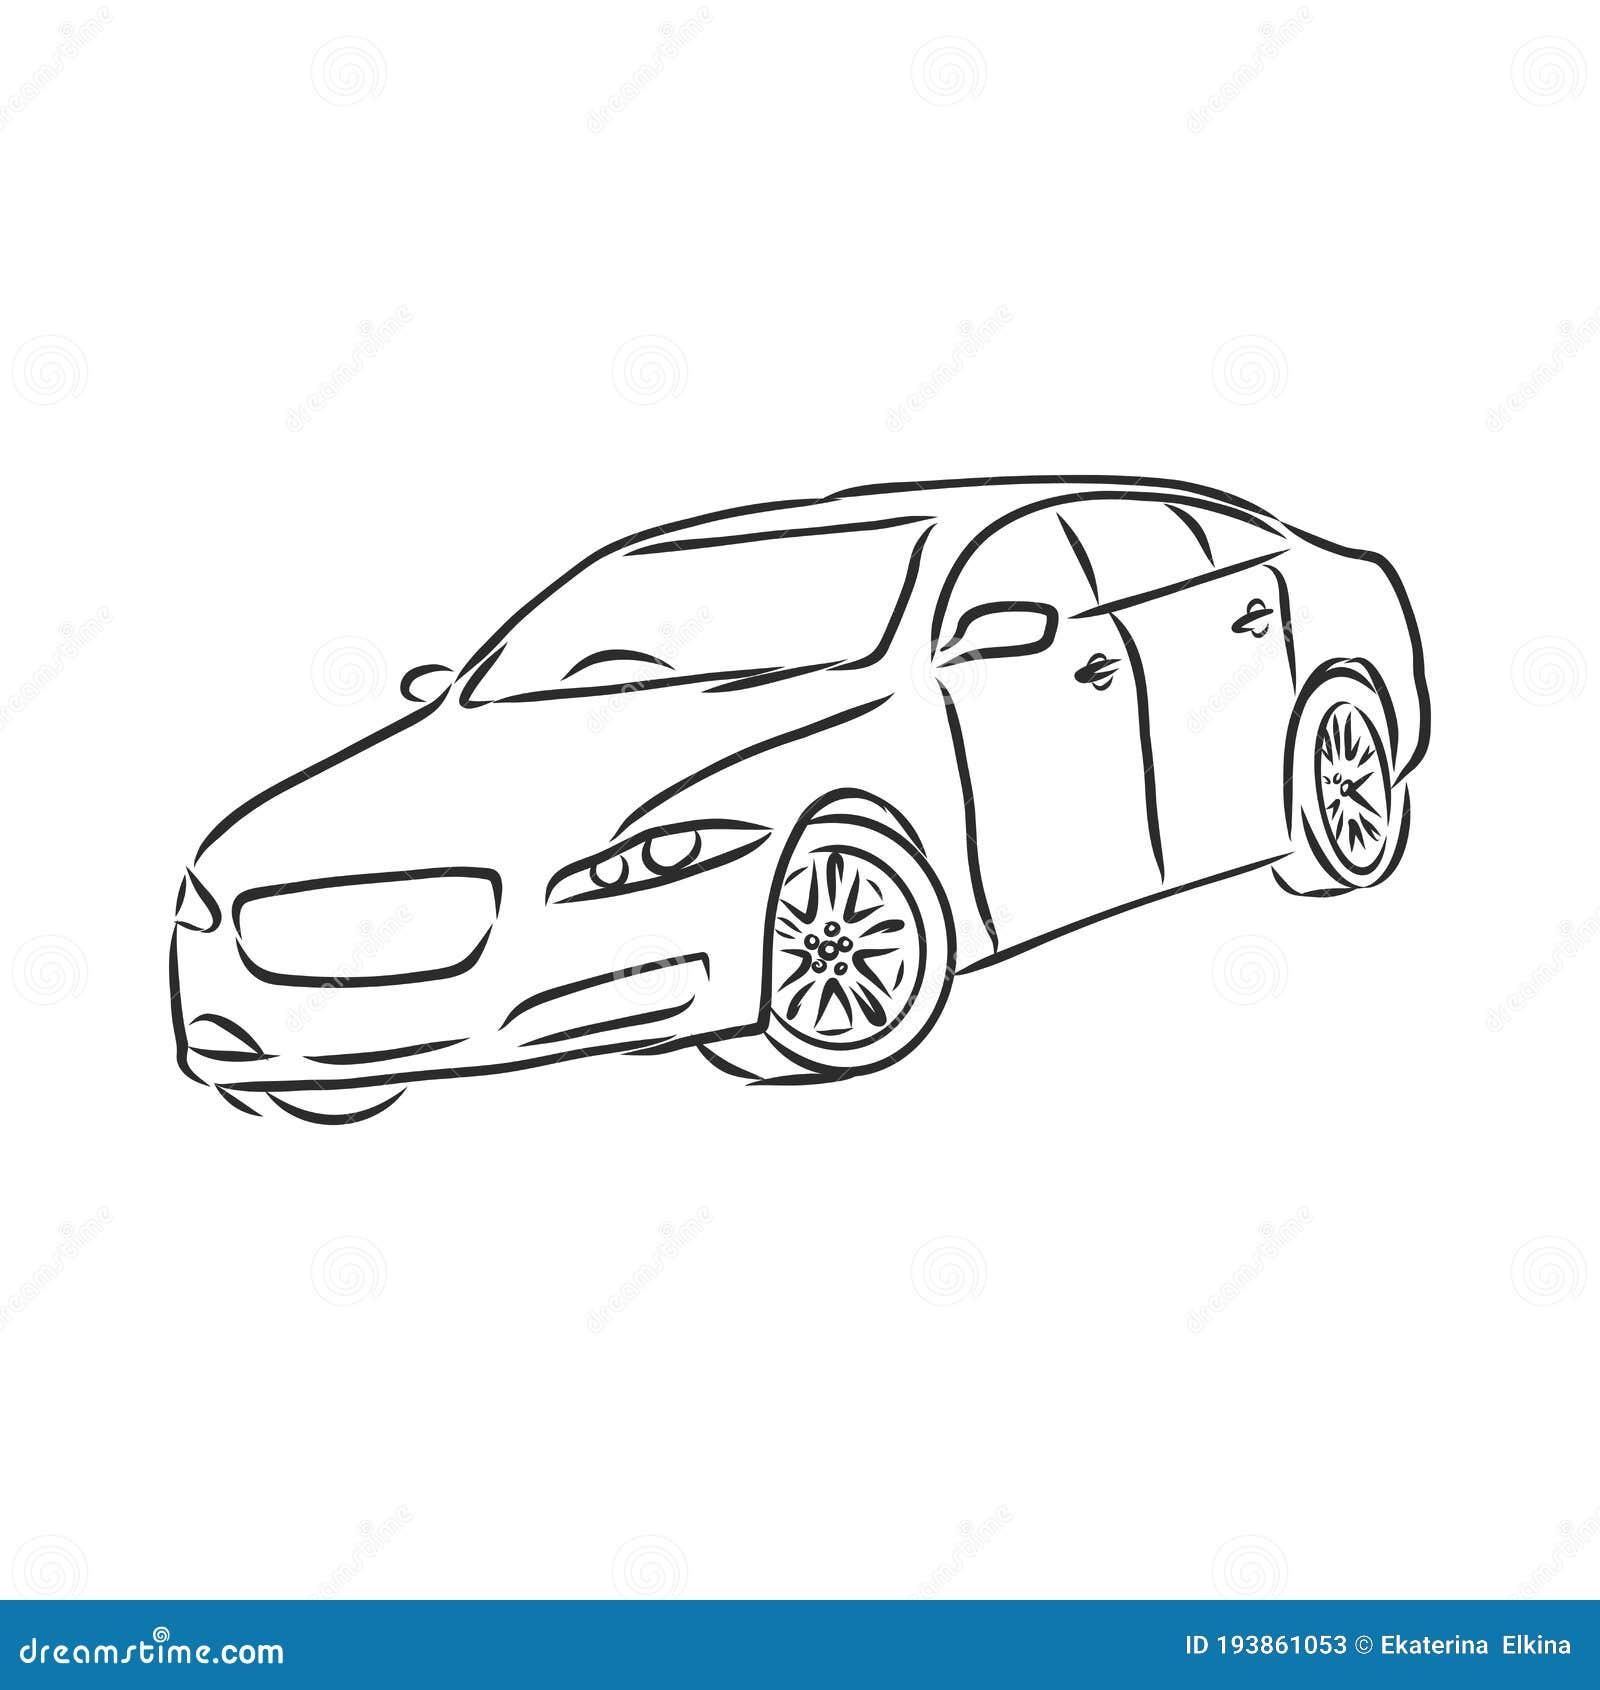 Car Concept Sketch Stock Illustrations 8 542 Car Concept Sketch Stock Illustrations Vectors Clipart Dreamstime